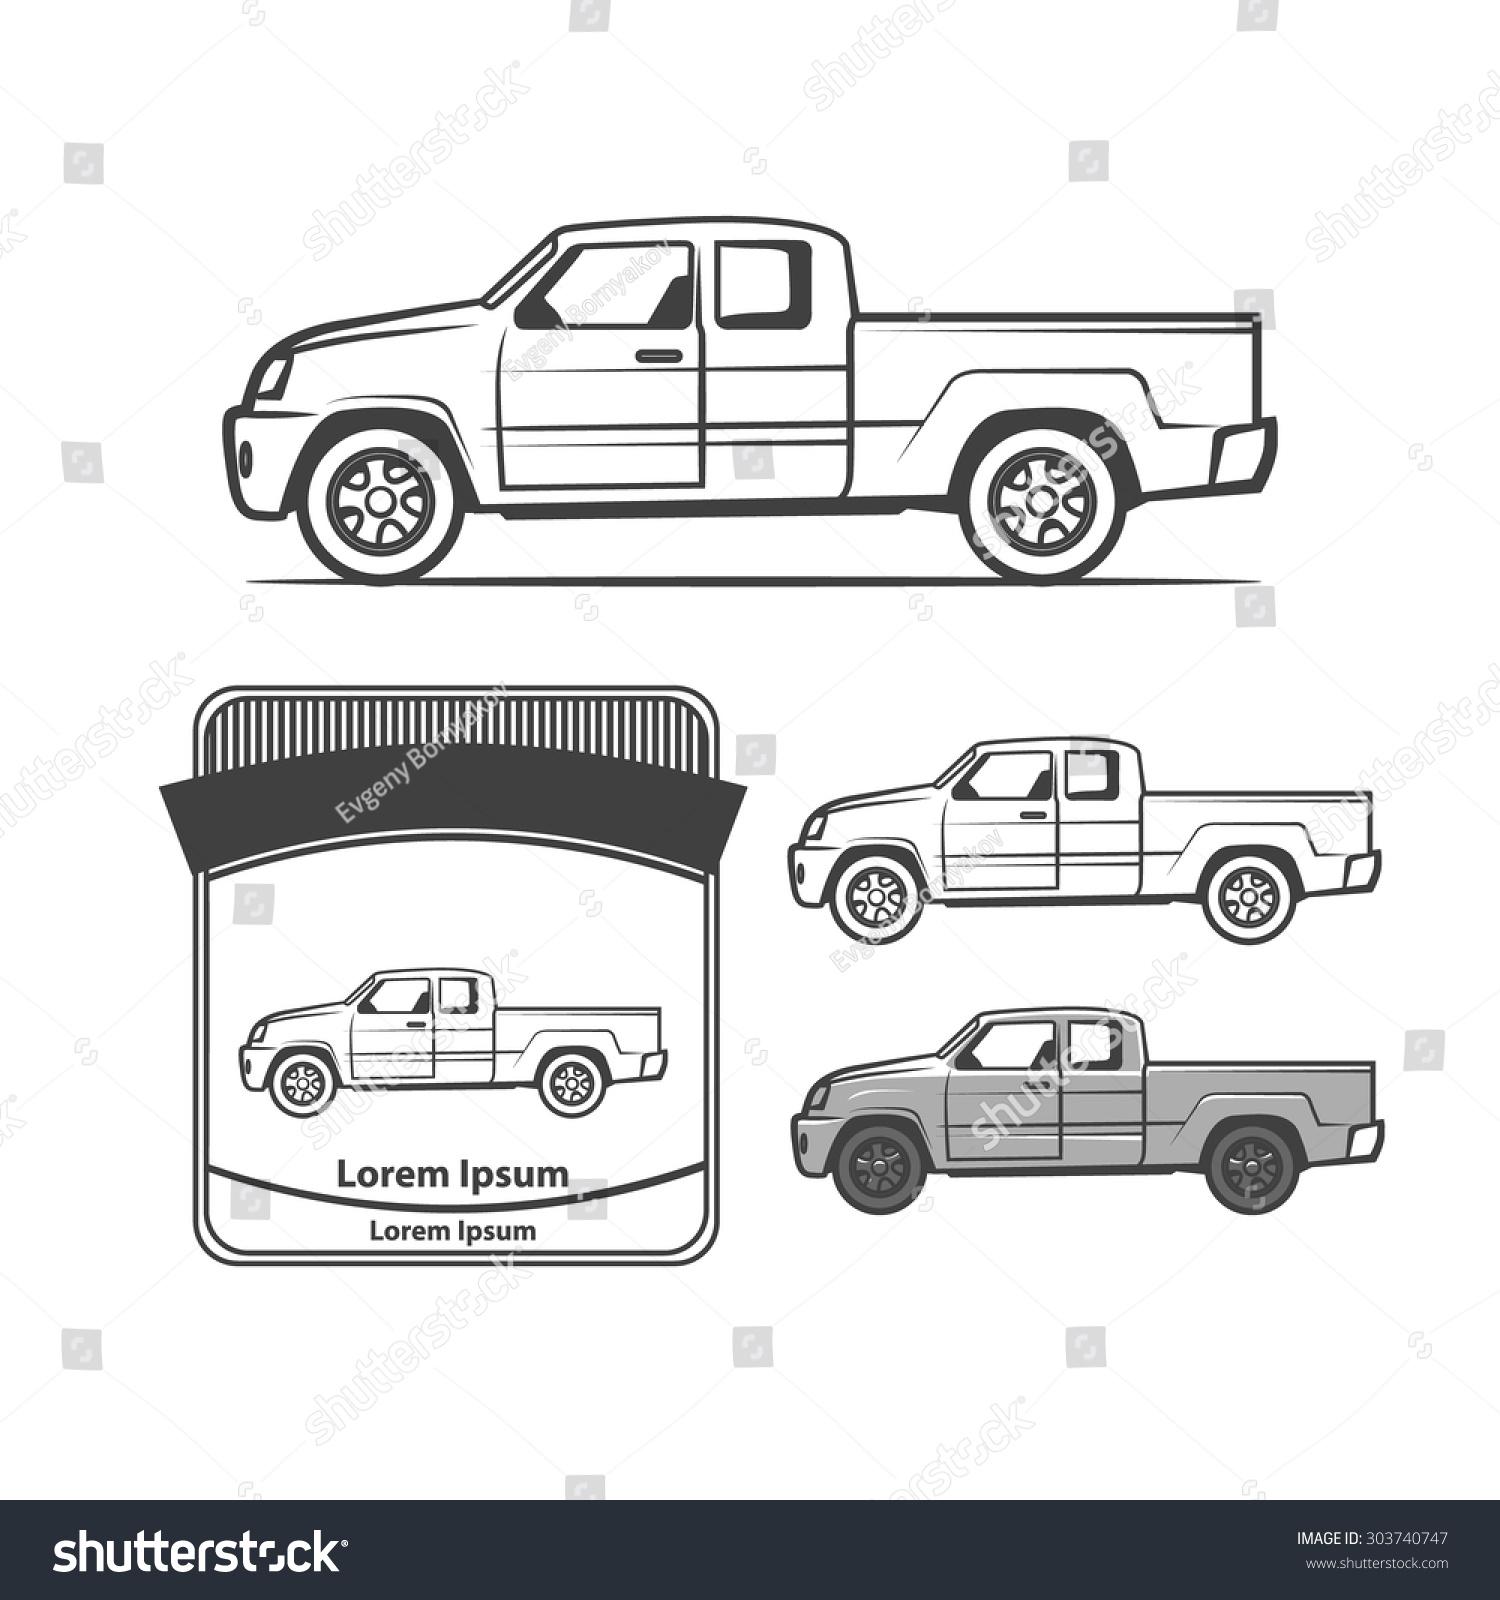 Design car club logo - Pick Up Profile View Club Logo Design Elements Emblems